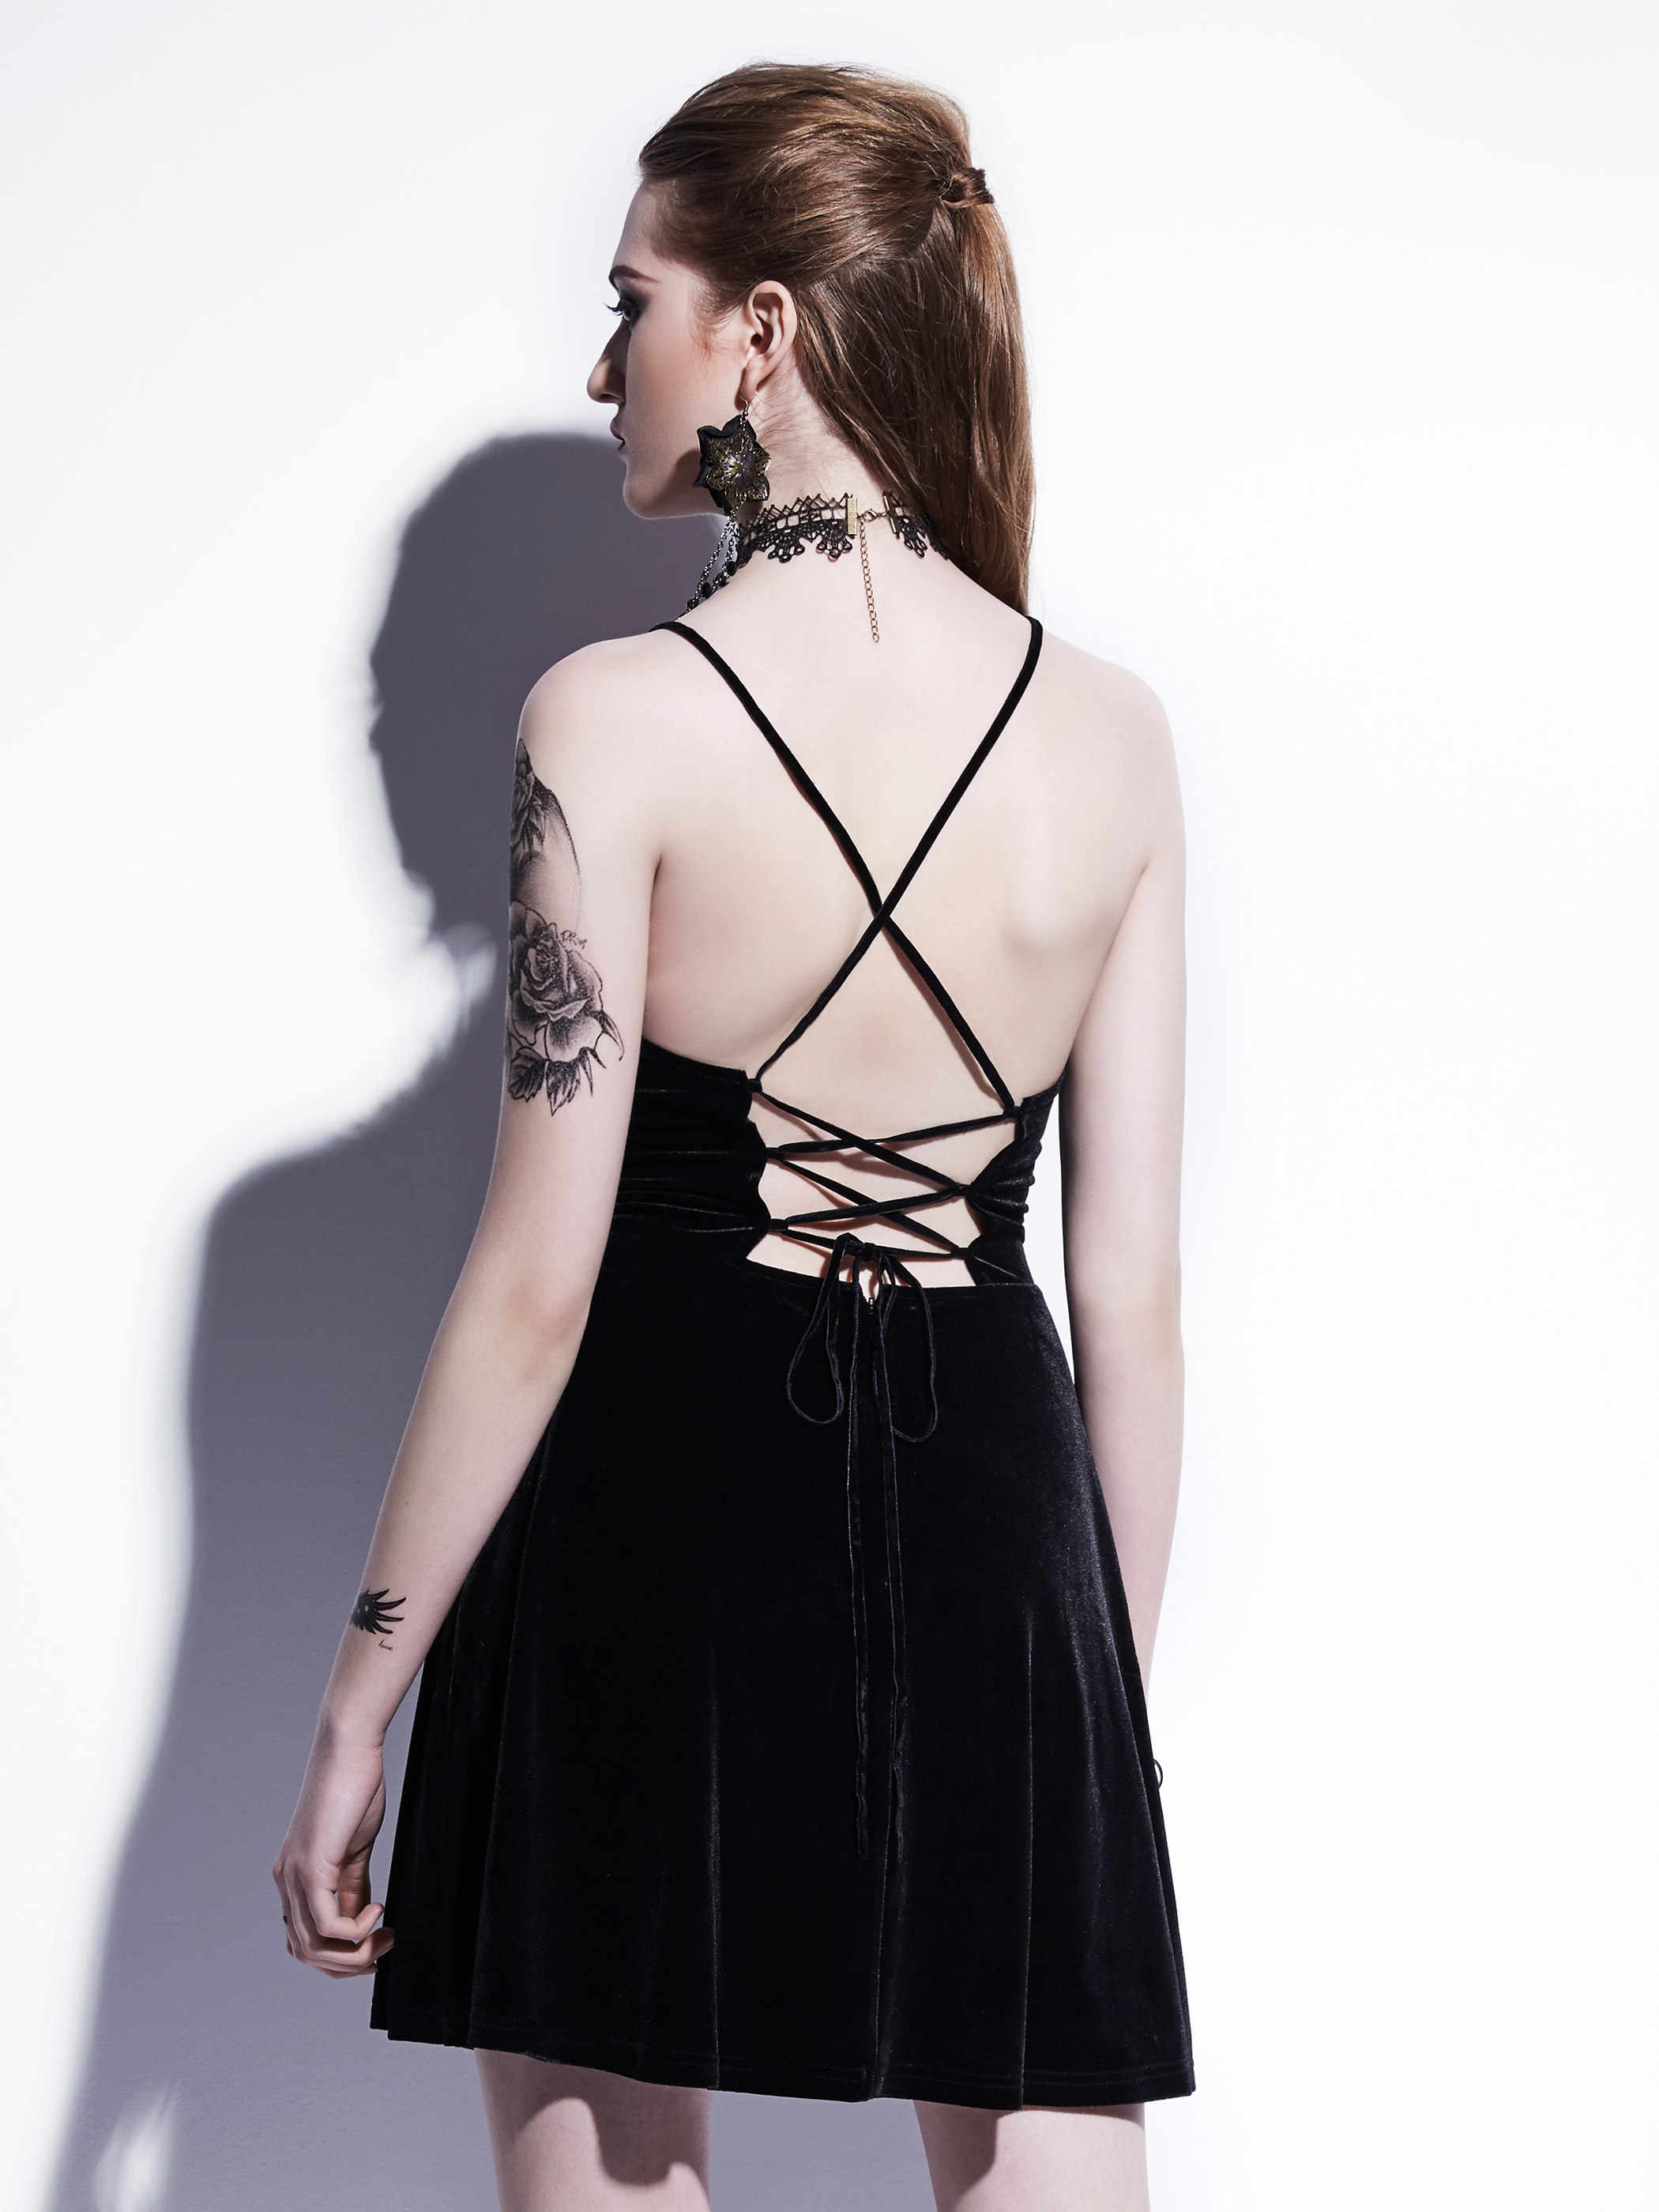 f8553f6128f ... Gothic Mini Dress 2018 Black Summer Women Sexy Short Dress Velvet  Backless Lace-Up Spaghetti ...